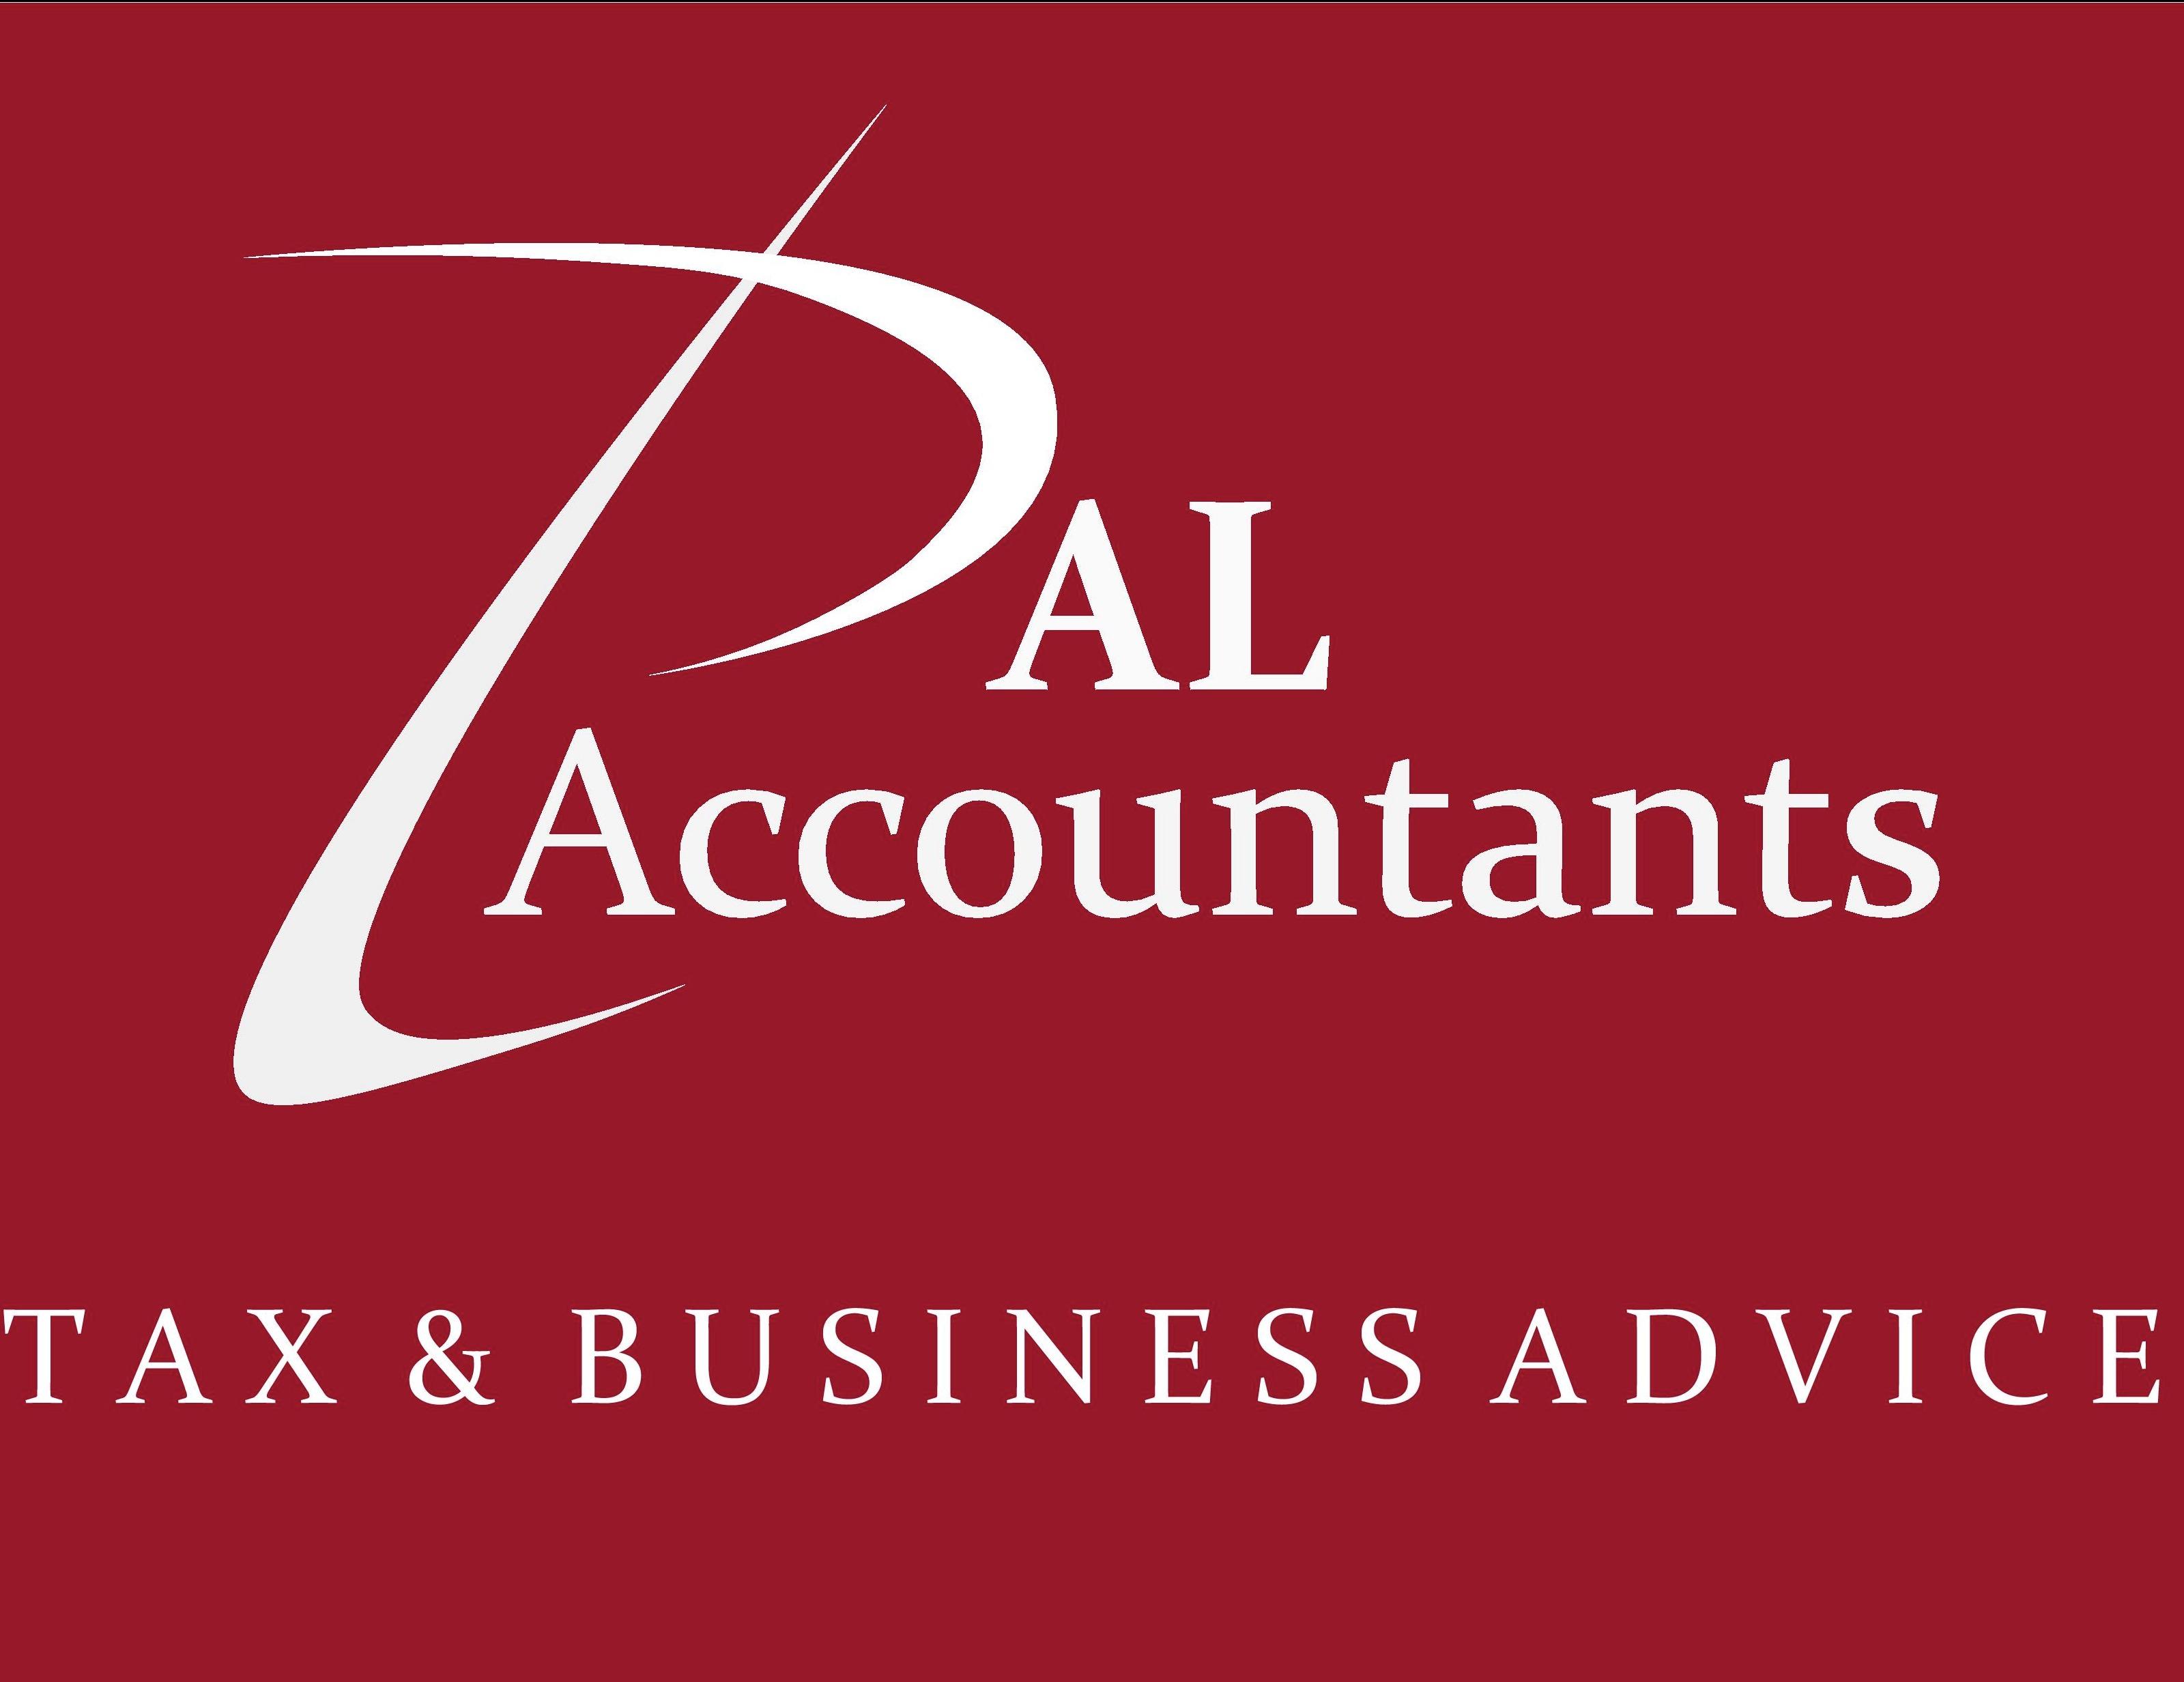 PAL Accountants